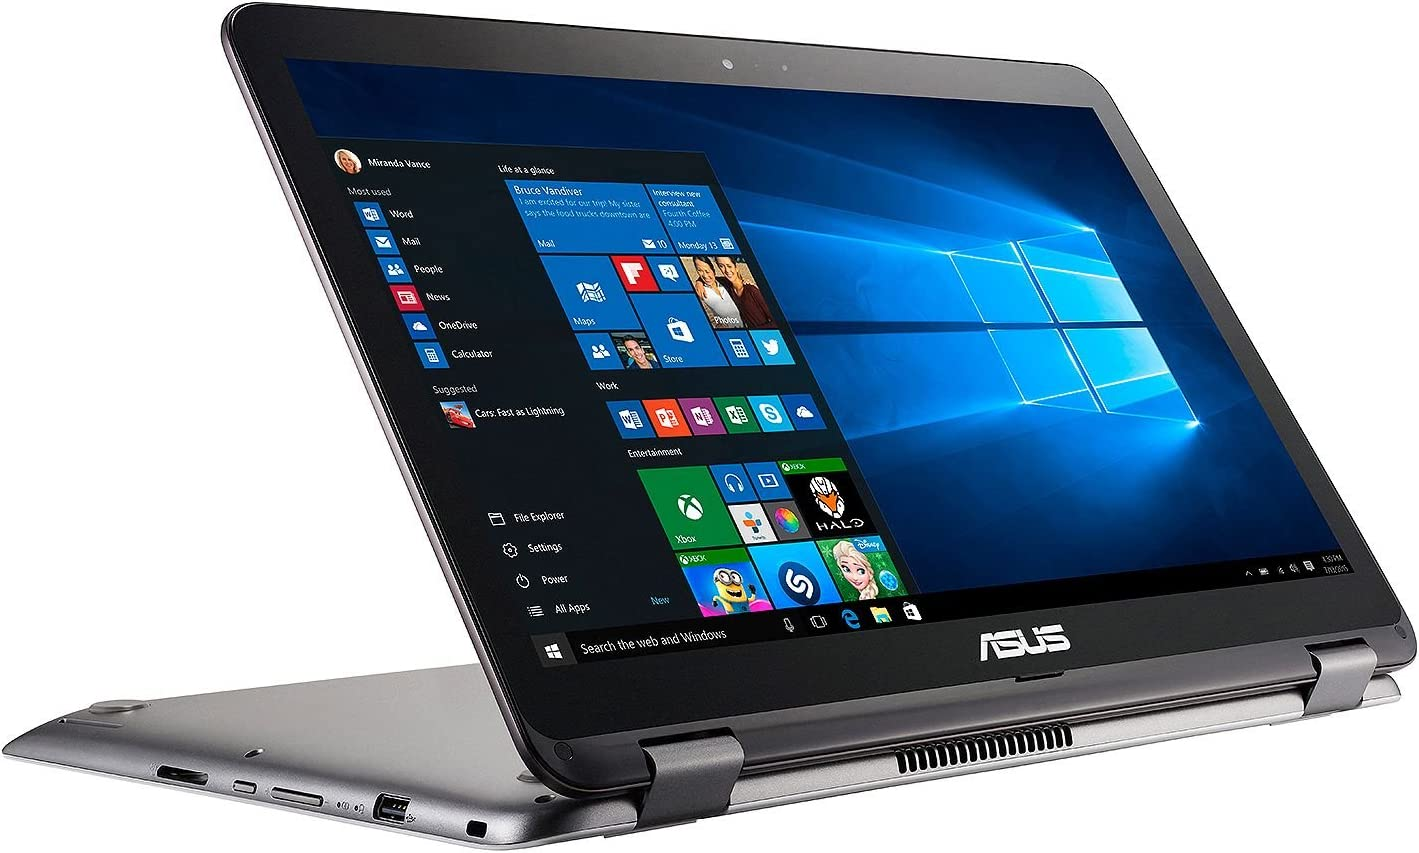 "ASUS Flip Convertible 2-in-1 Full HD 15.6"" Touchscreen Laptop, Intel Core i7-6500U Processor 2.5 GHz, 12GB DDR4 Memory, 1TB Hard Drive, USB 3.1 Type C, 802.11ac, HDMI, Bluetooth, Win 10"